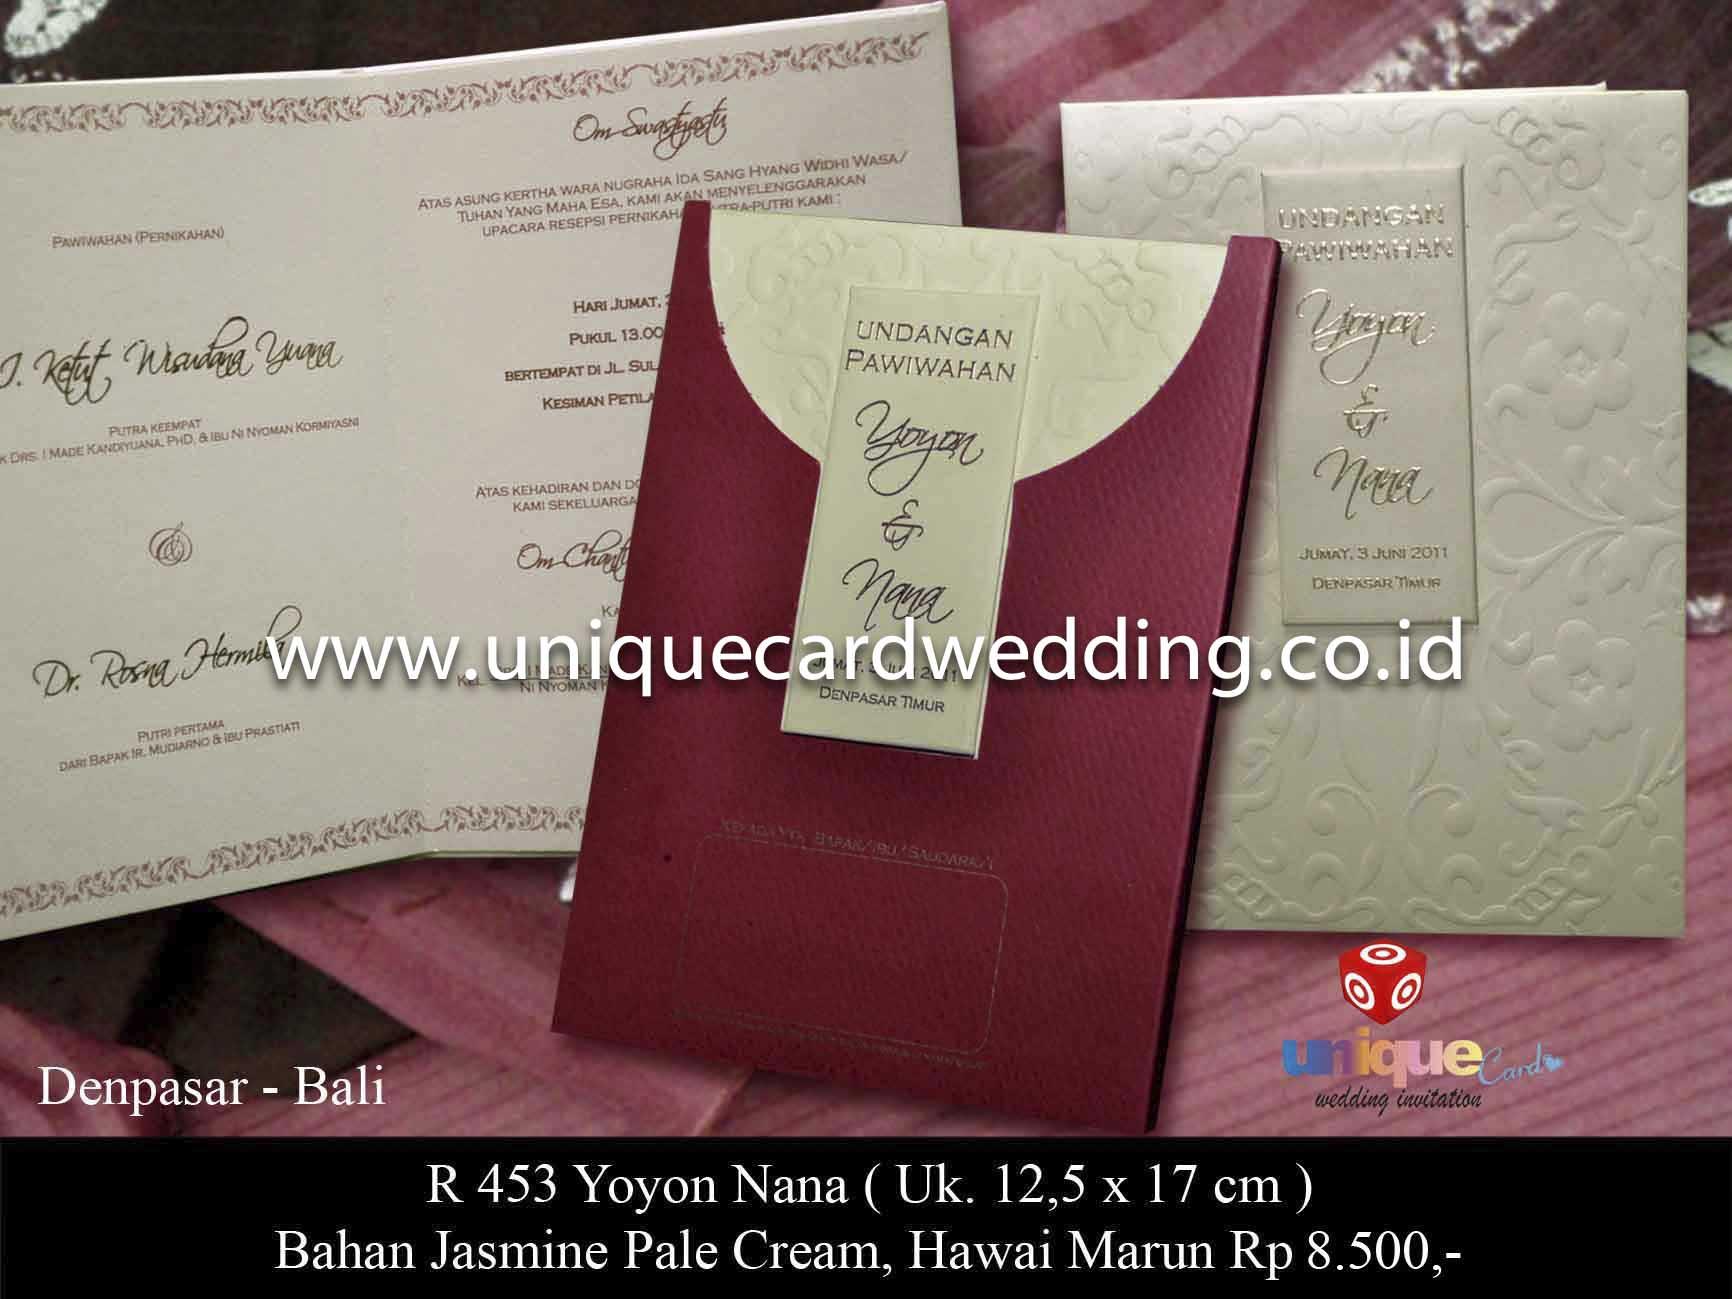 WEDDING INVITATION – Pusat Kartu Undangan